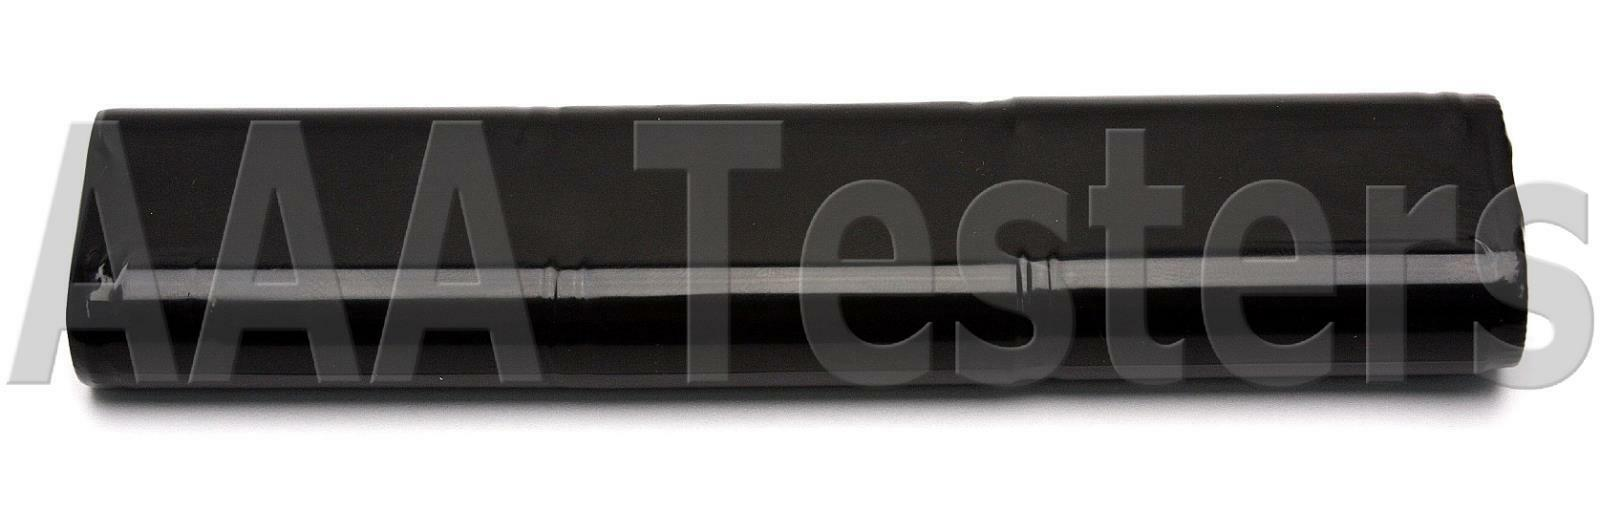 0090041000 Battery for TRILITHIC 860DSP field analyzer 860DSPi field analyzer